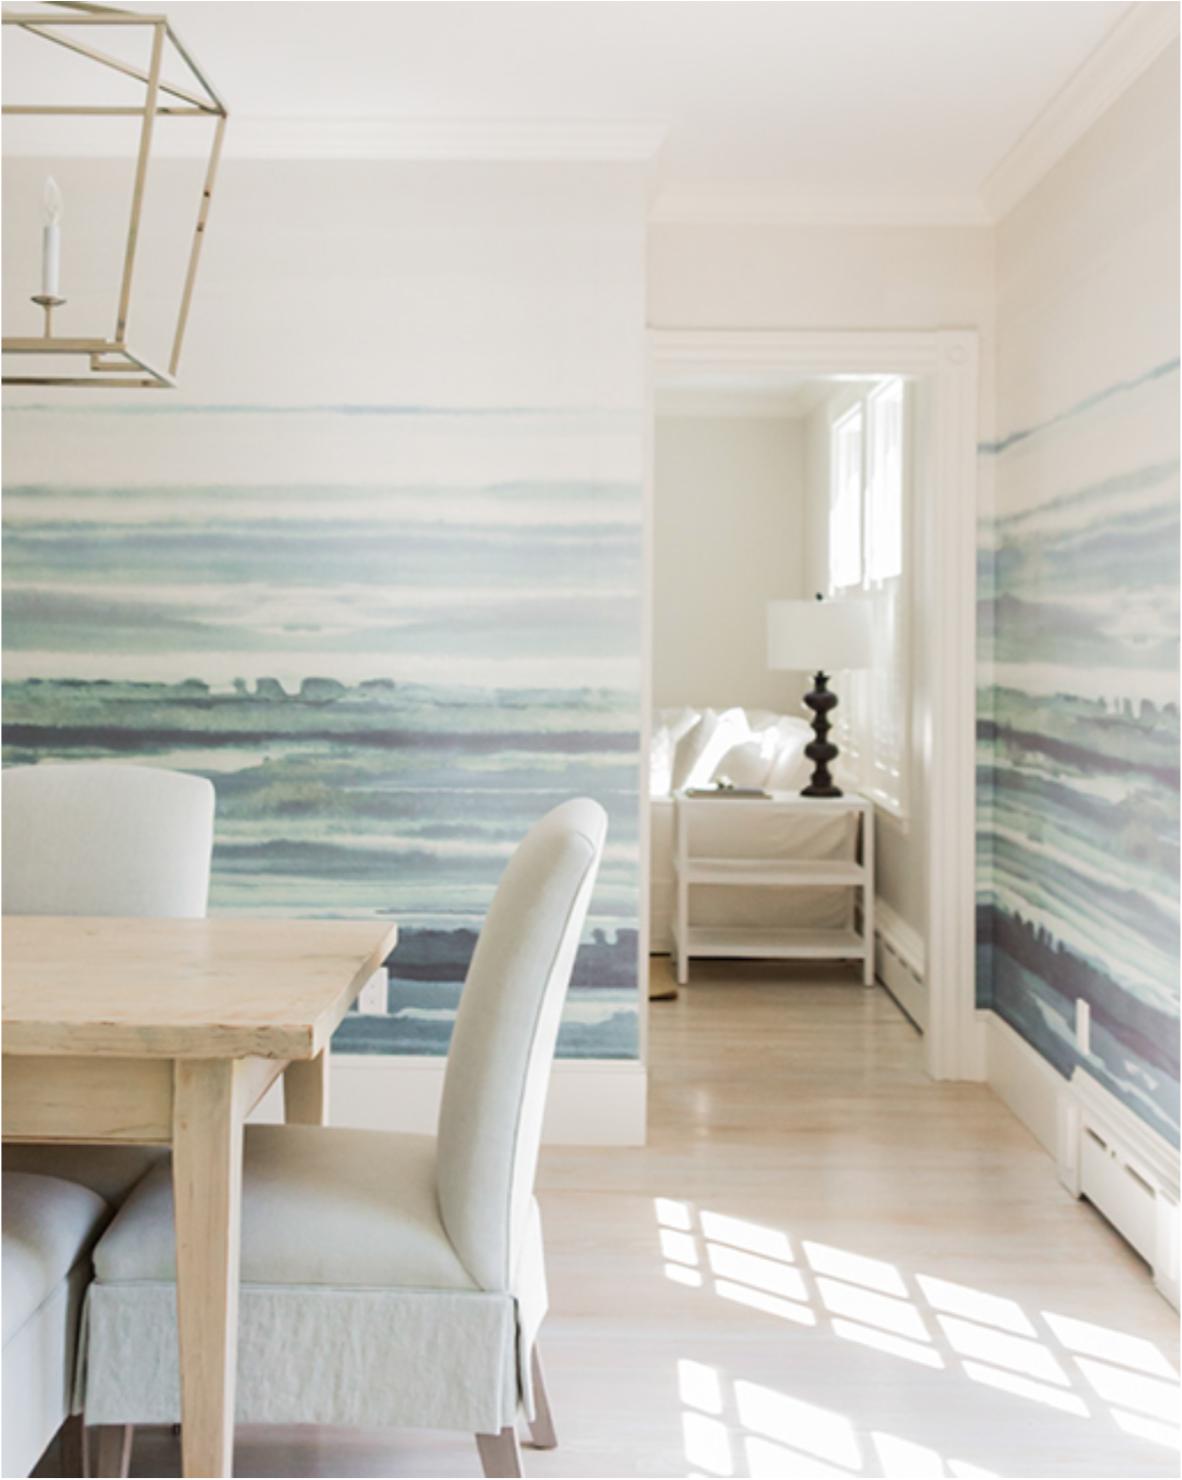 Leslie B Cutler Interior Design photo by Michael J Lee #realdesigner #interiordesignbusiness #interiordesignerinterview